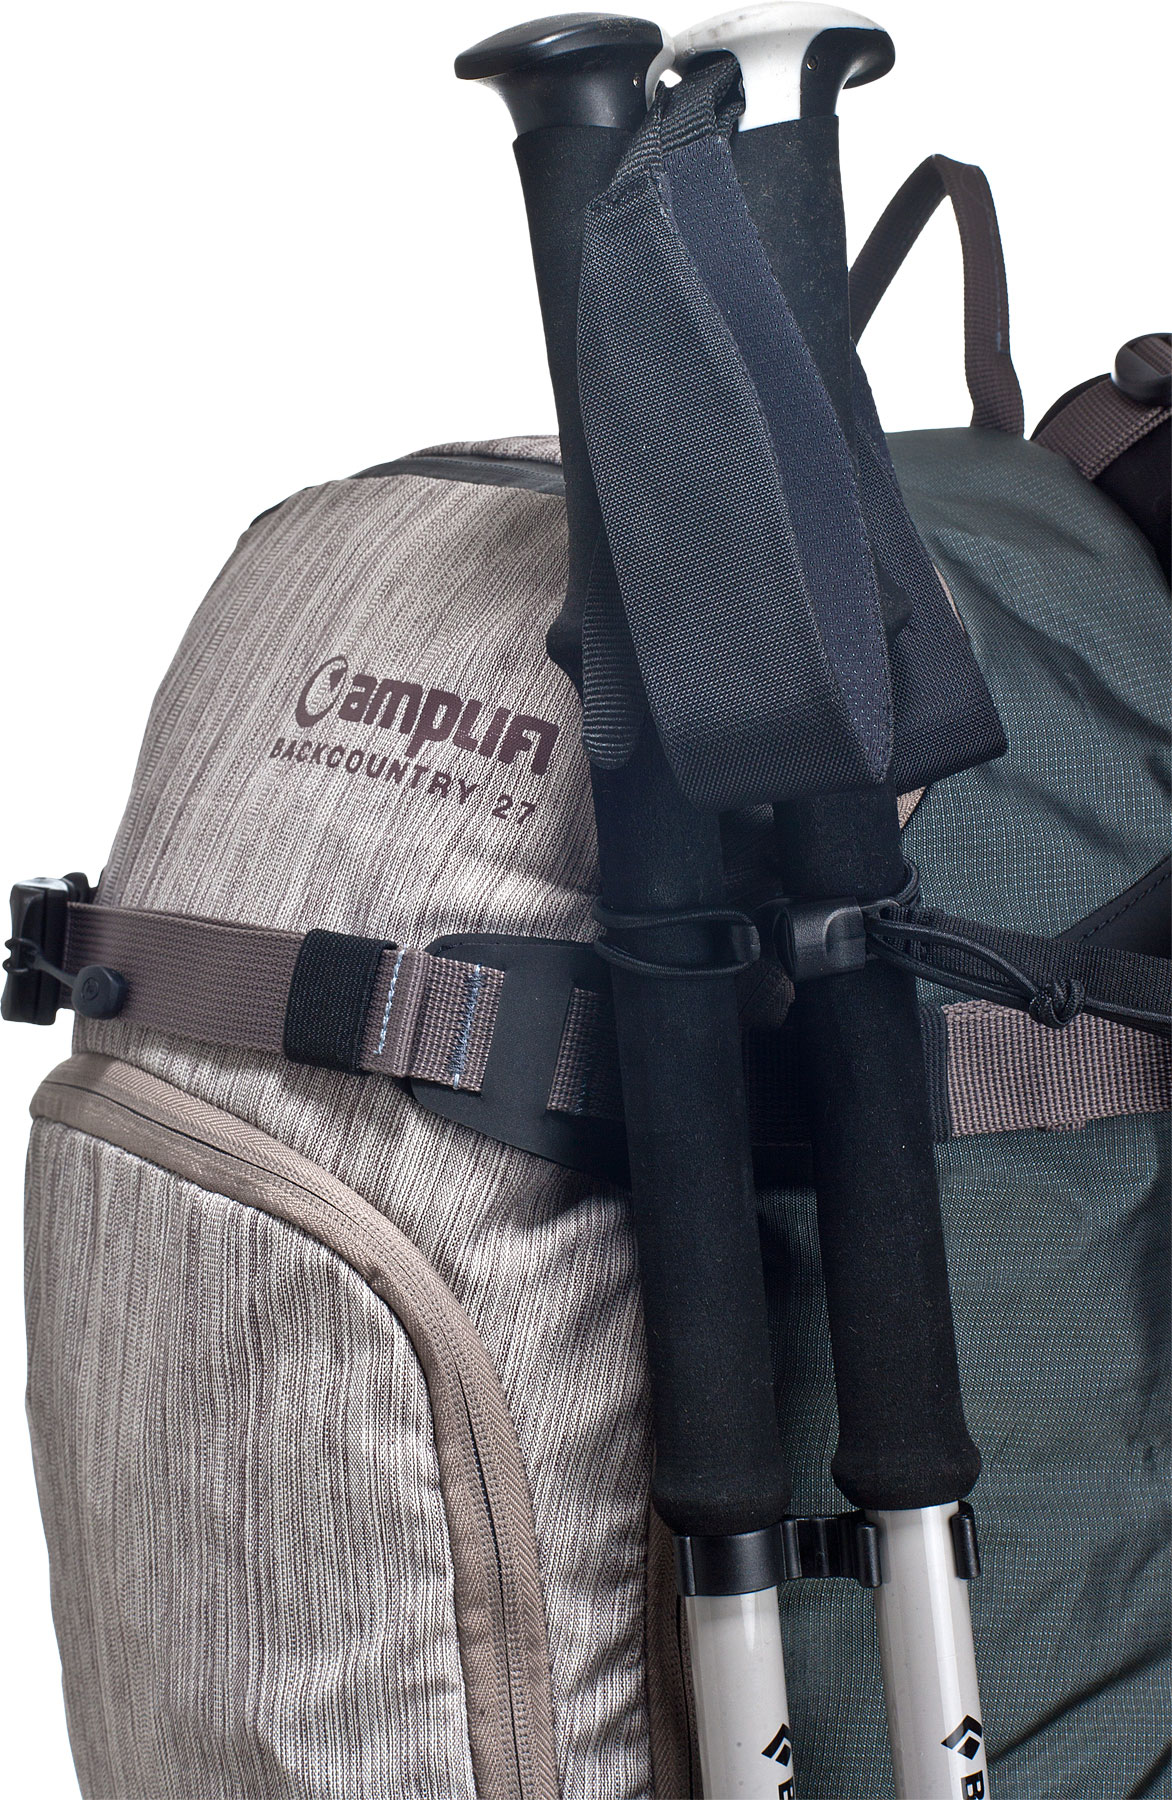 amplifi_backcountry27_detail03